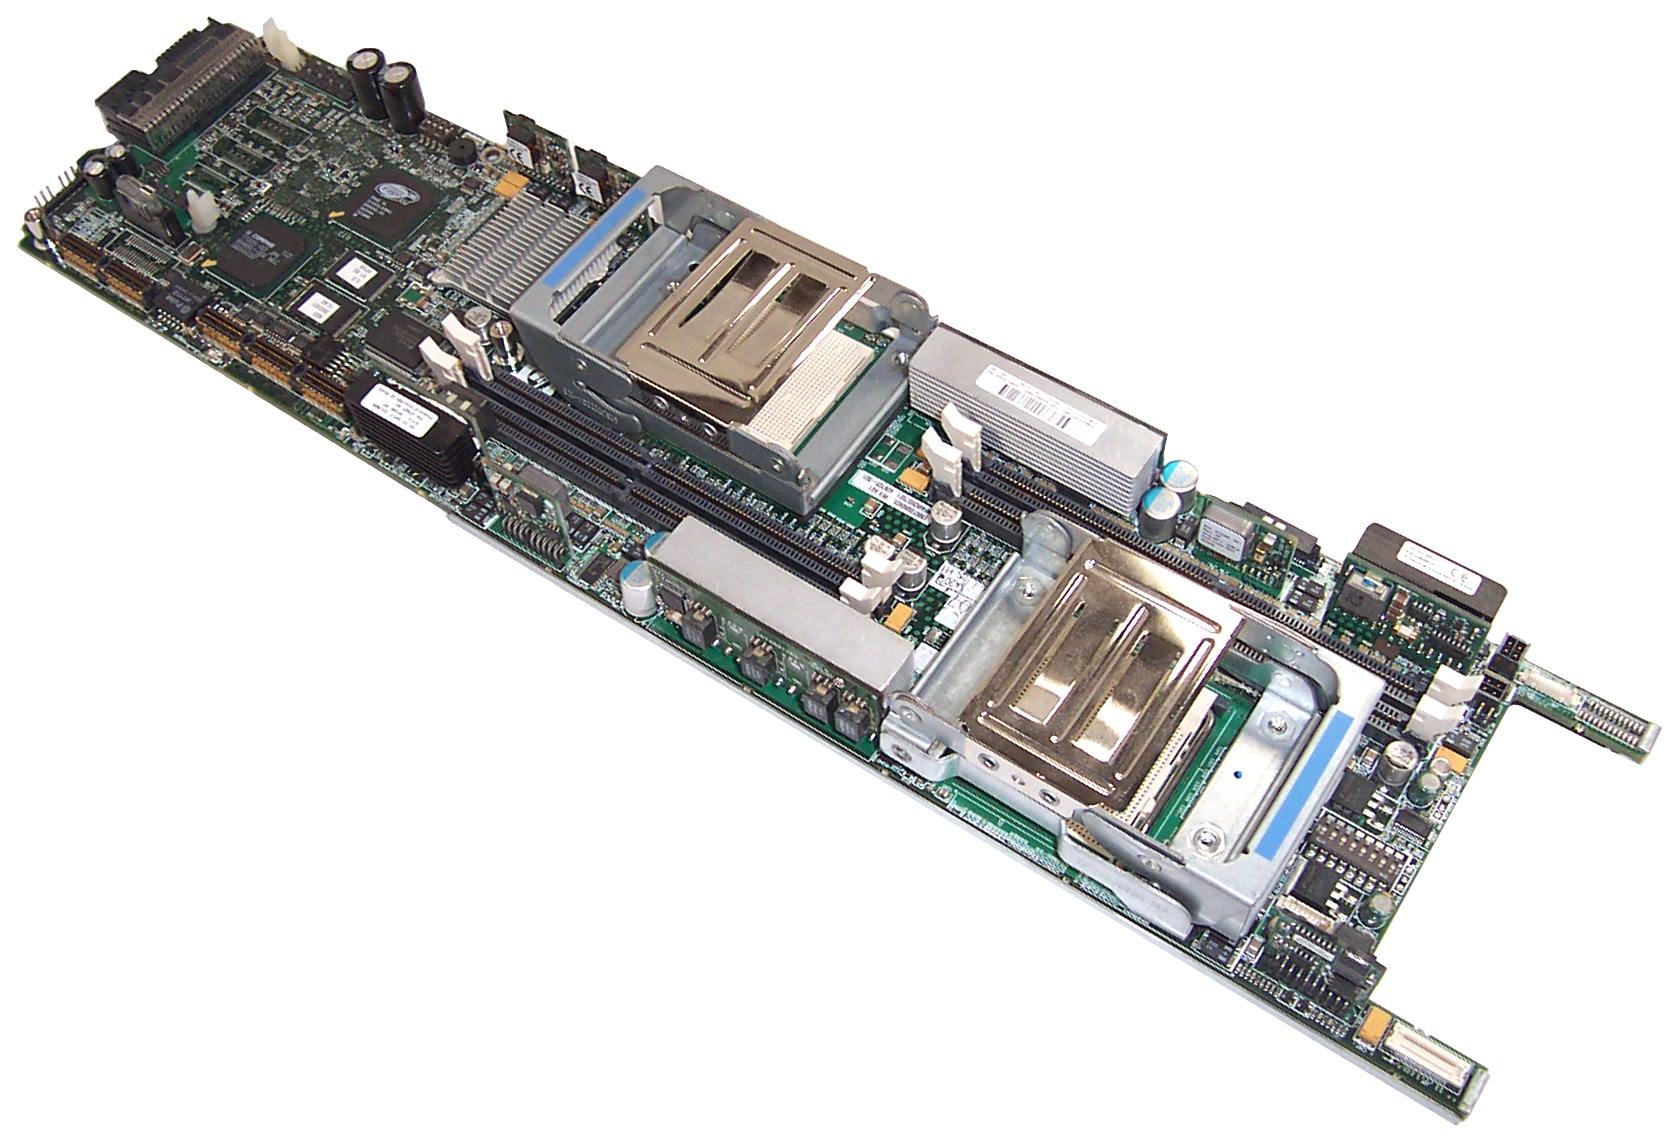 HP 374960-001 ProLiant BL35p Dual Socket 940 Motherboard